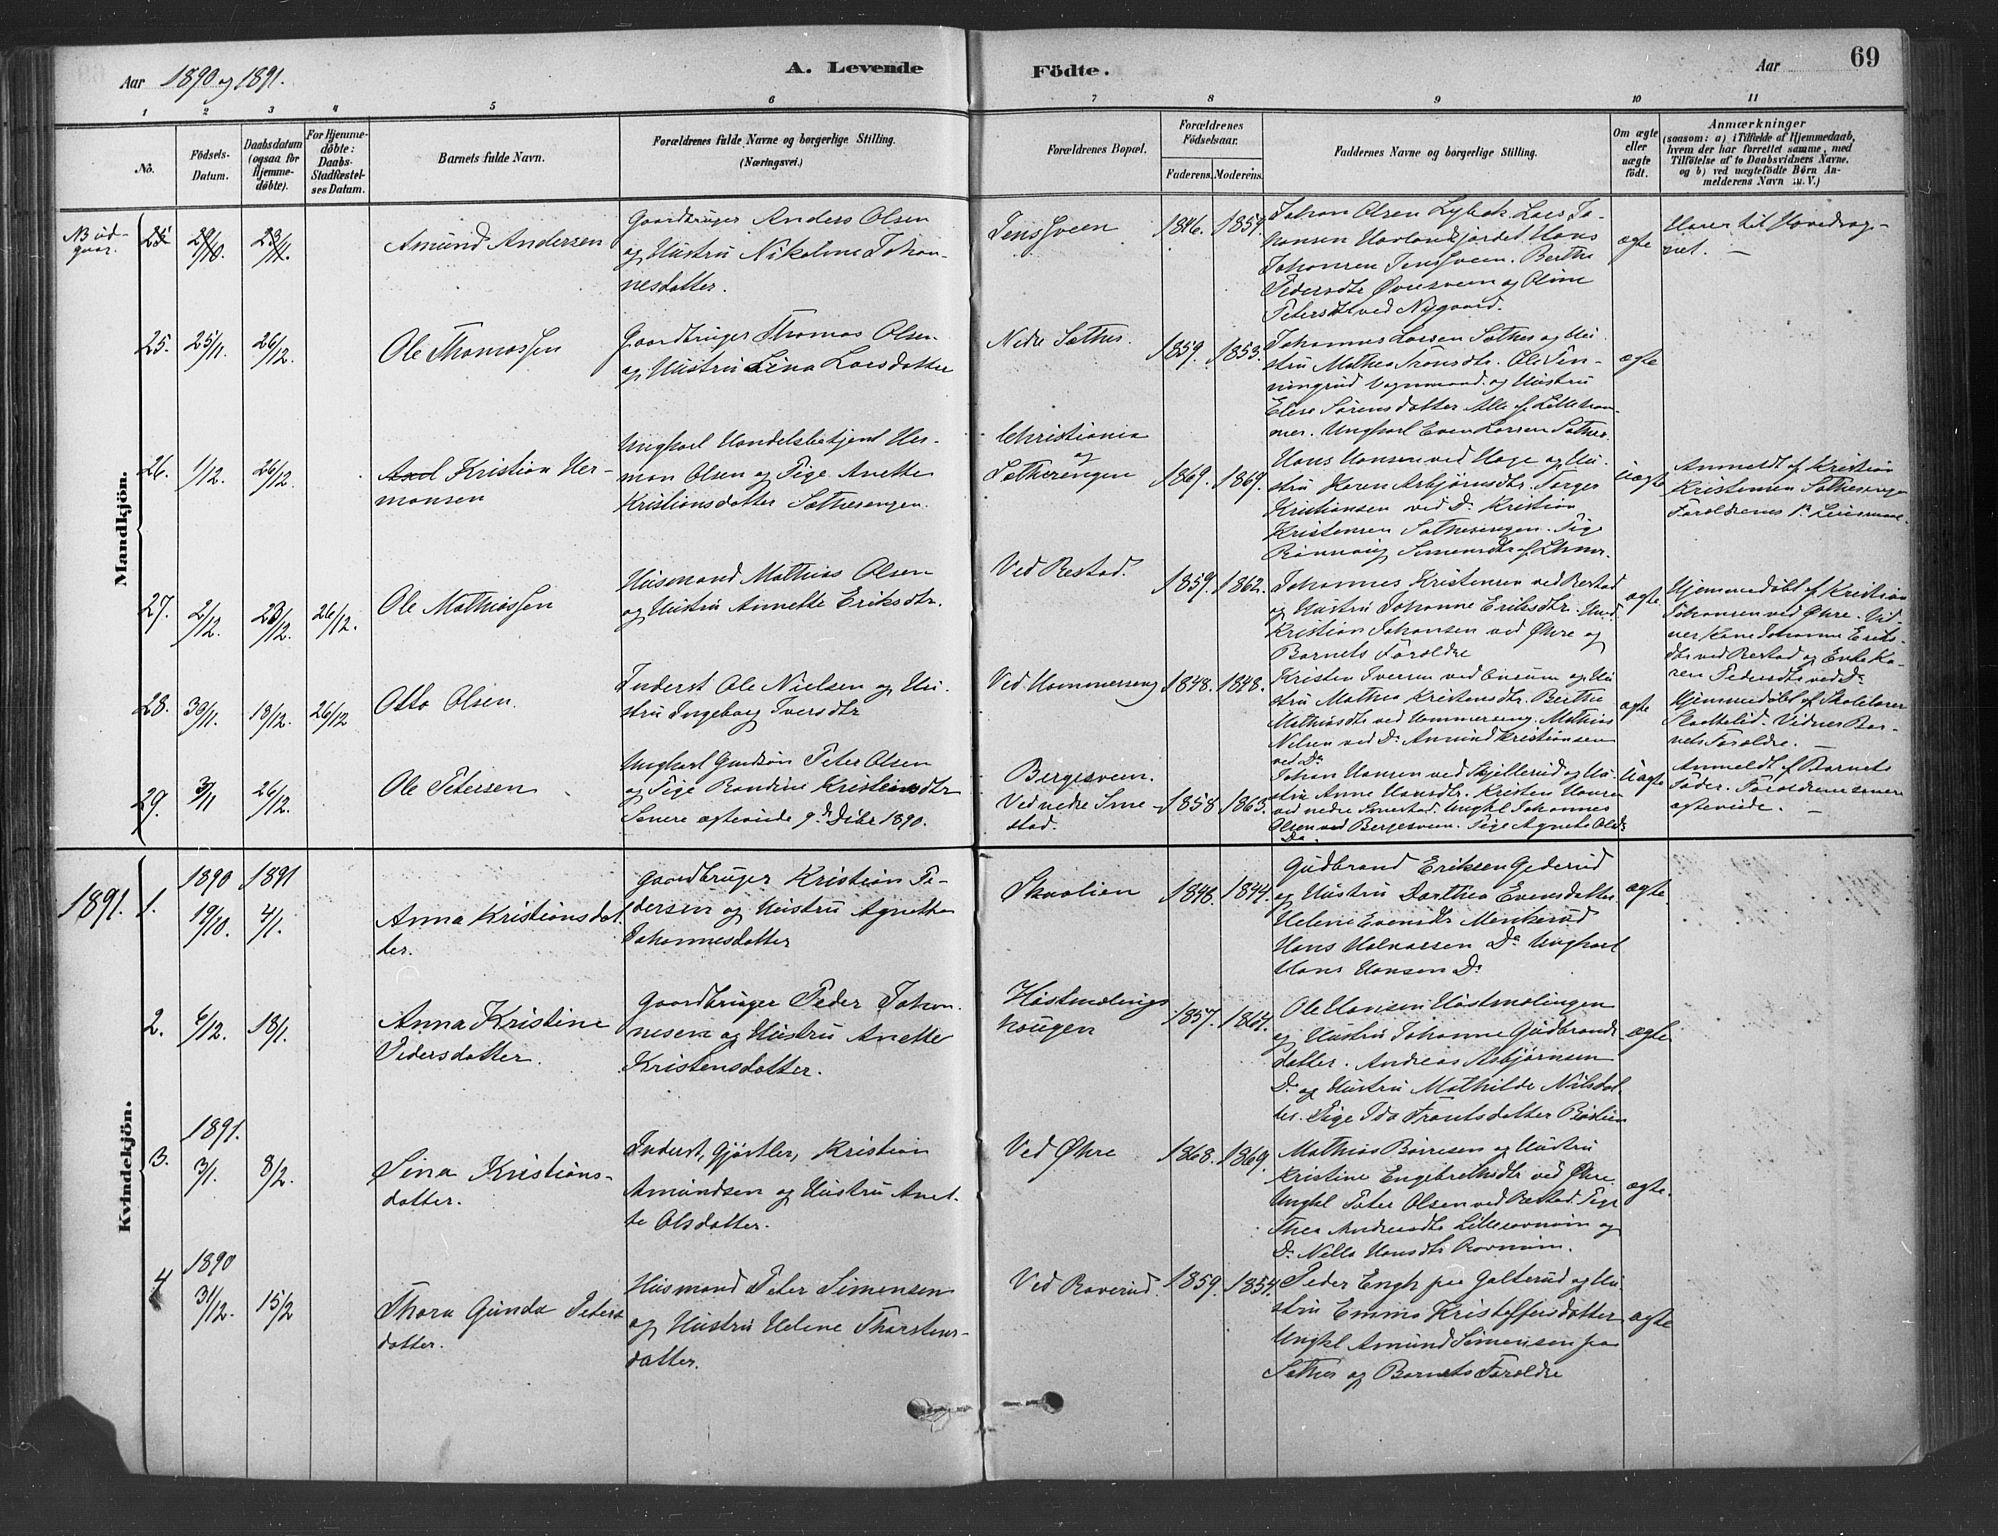 SAH, Fåberg prestekontor, Ministerialbok nr. 9, 1879-1898, s. 69